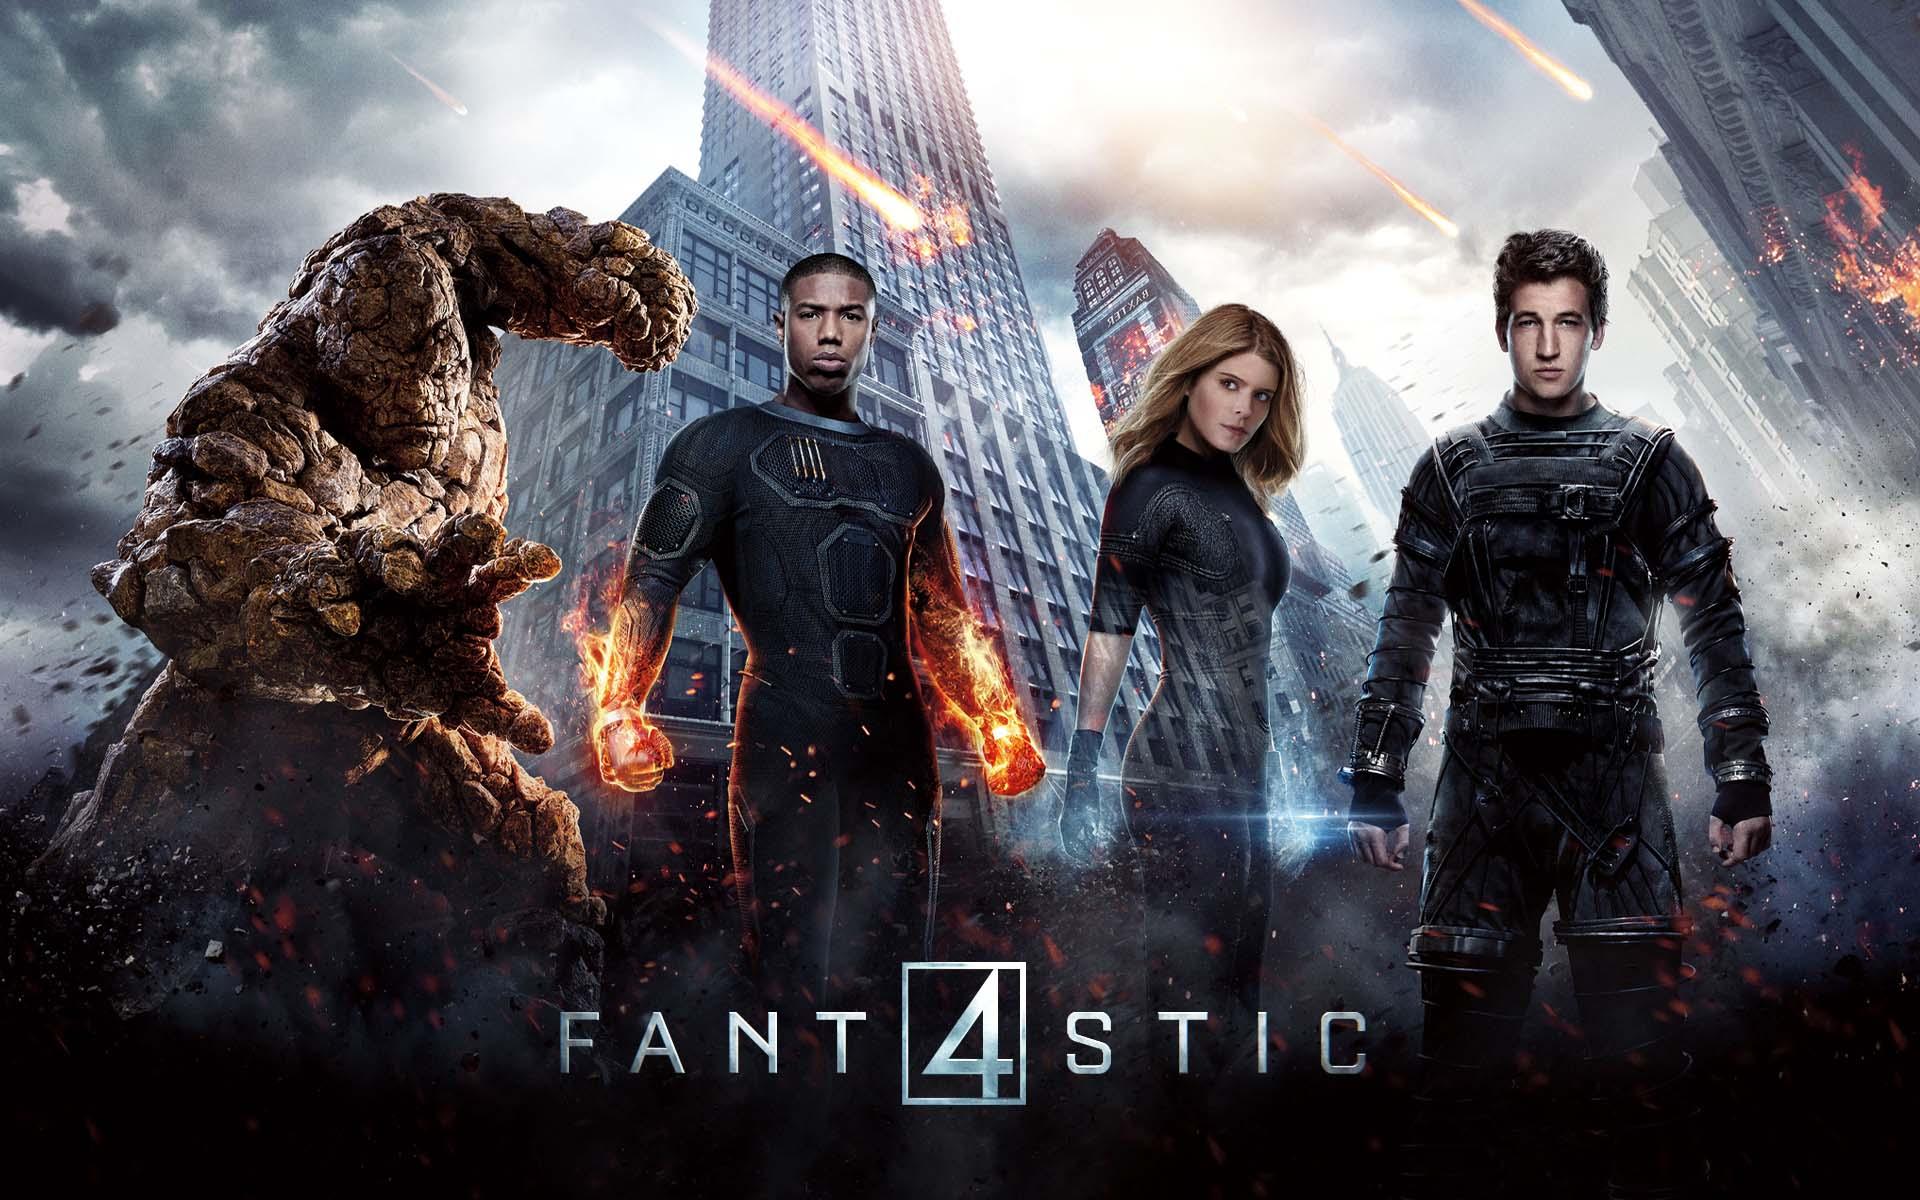 fanyastic 4